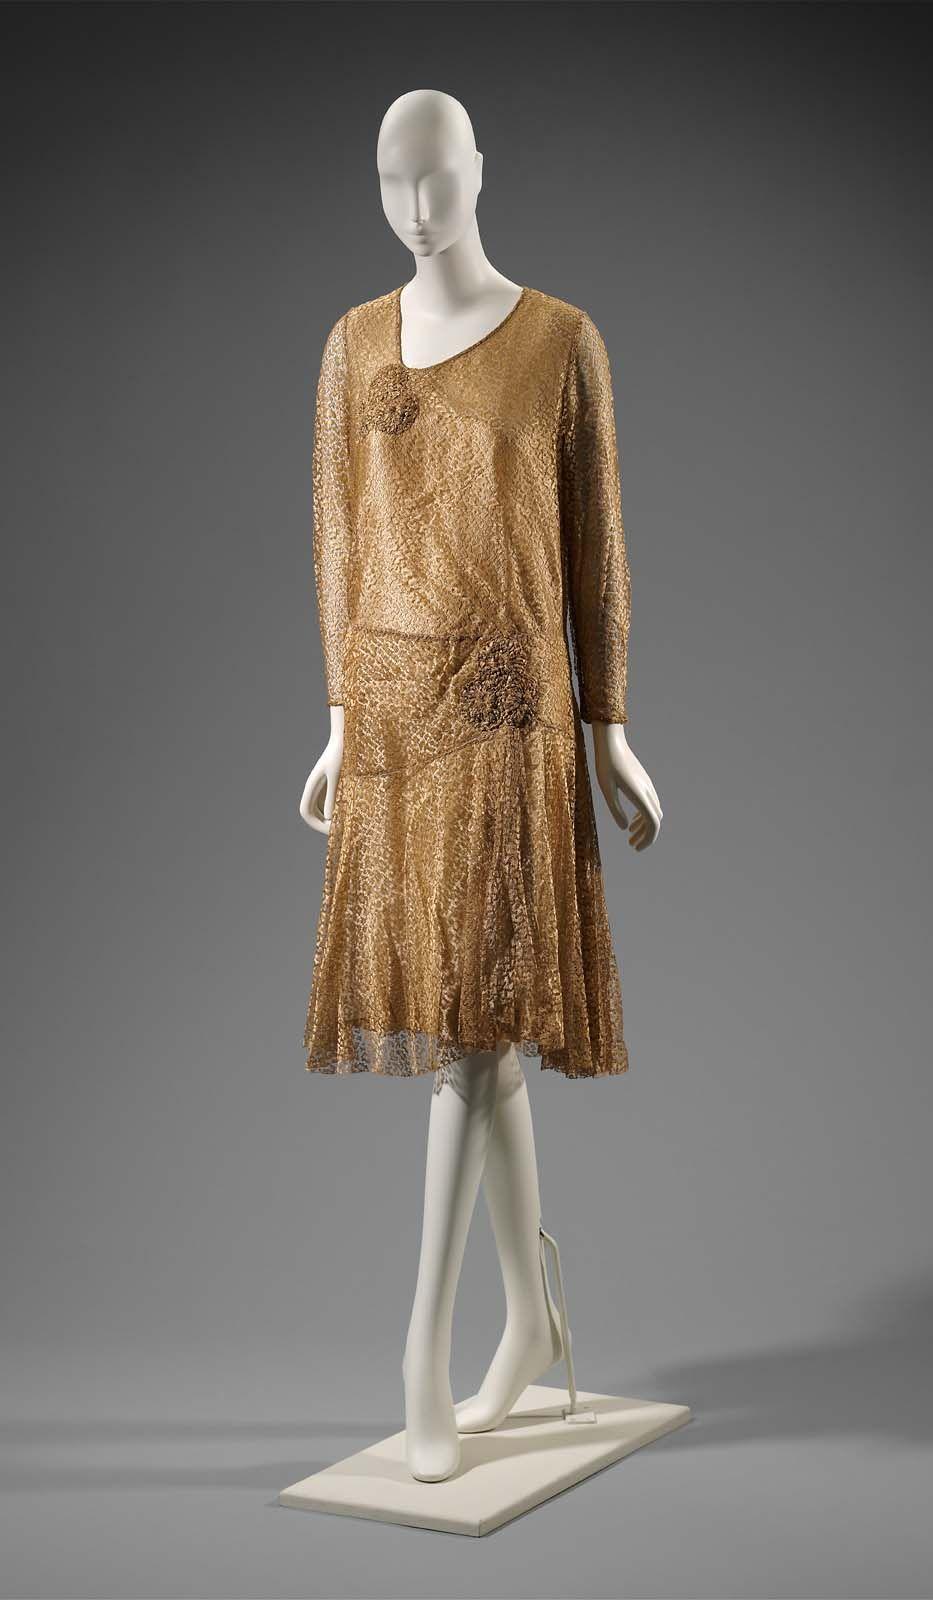 Dress - 1930s - American | Yesteryear Fashions - 1 | Pinterest